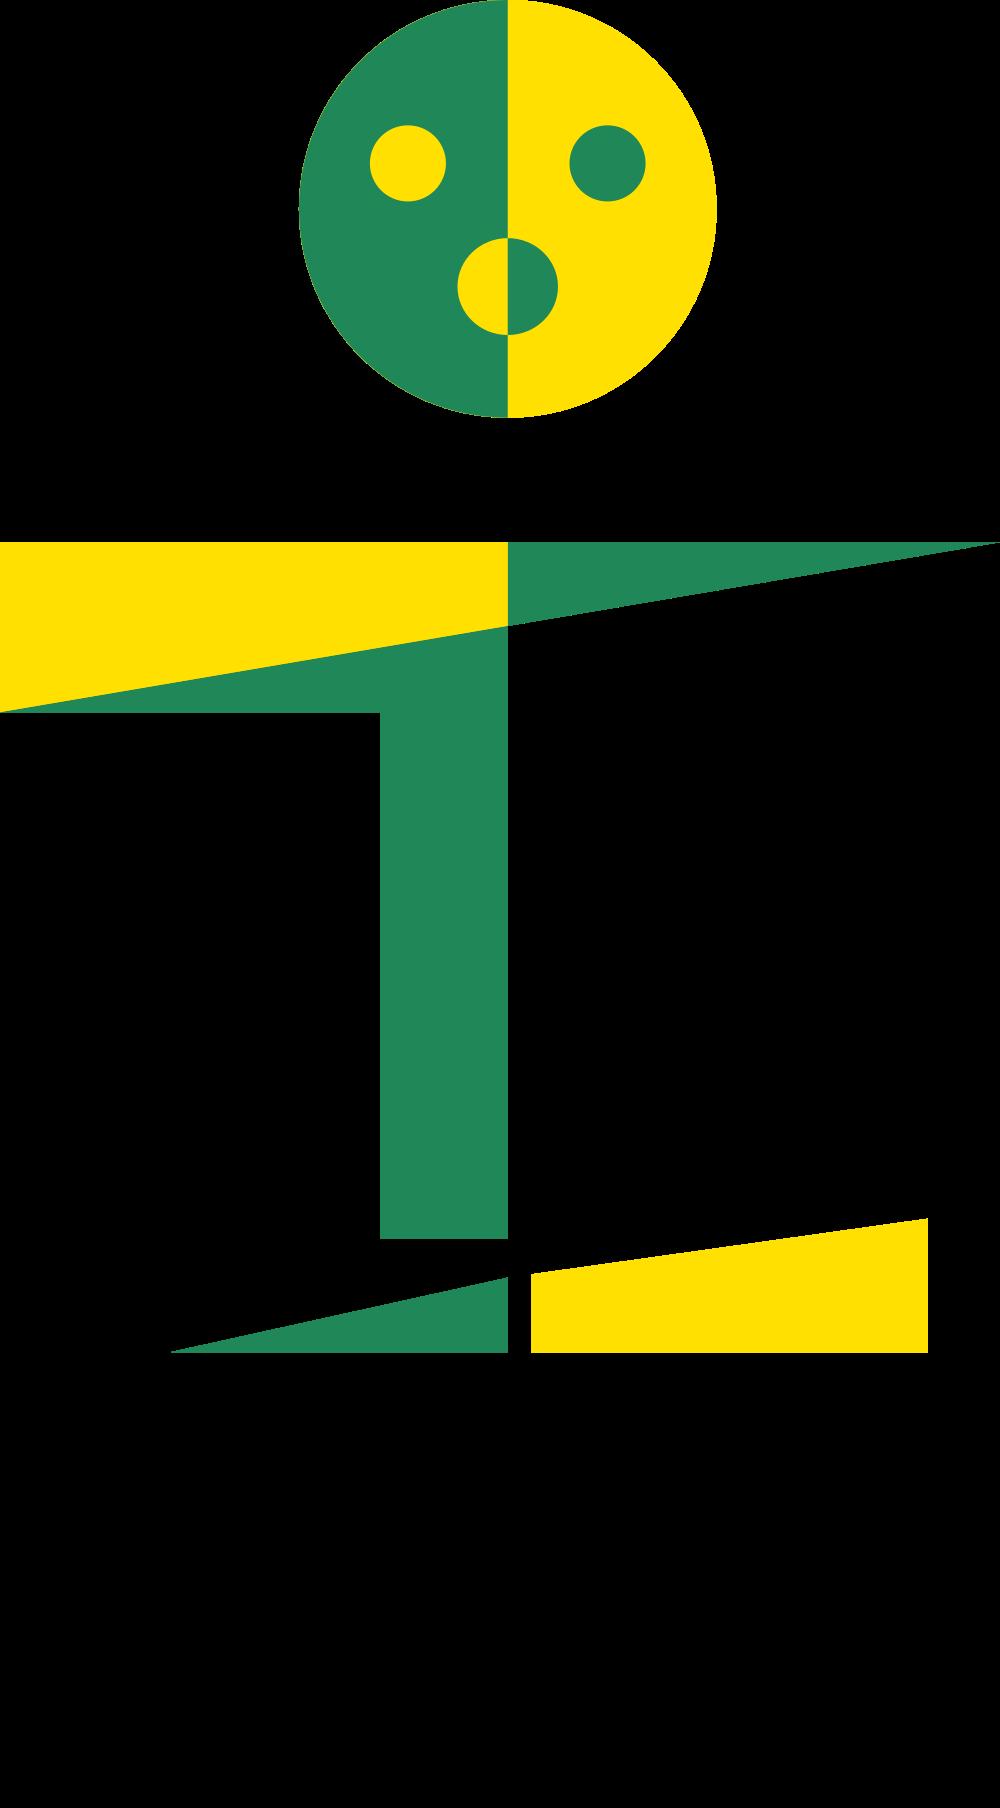 Böhm Möbel GmbH